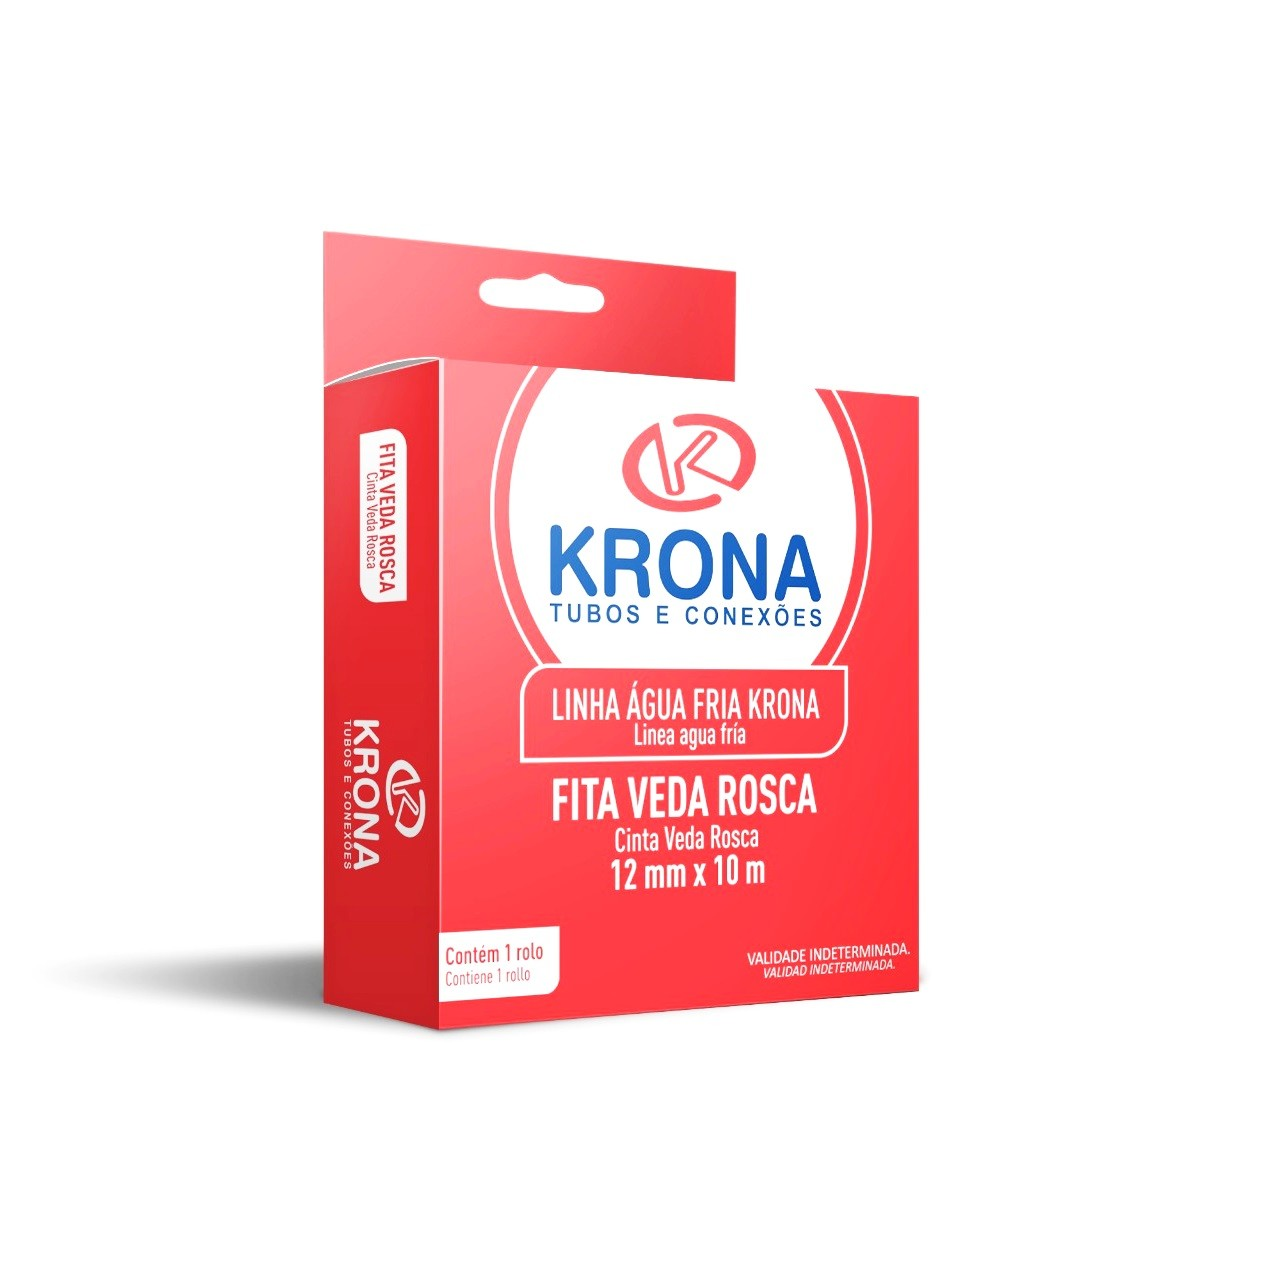 Fita Veda Rosca 12mm x 25m - Krona